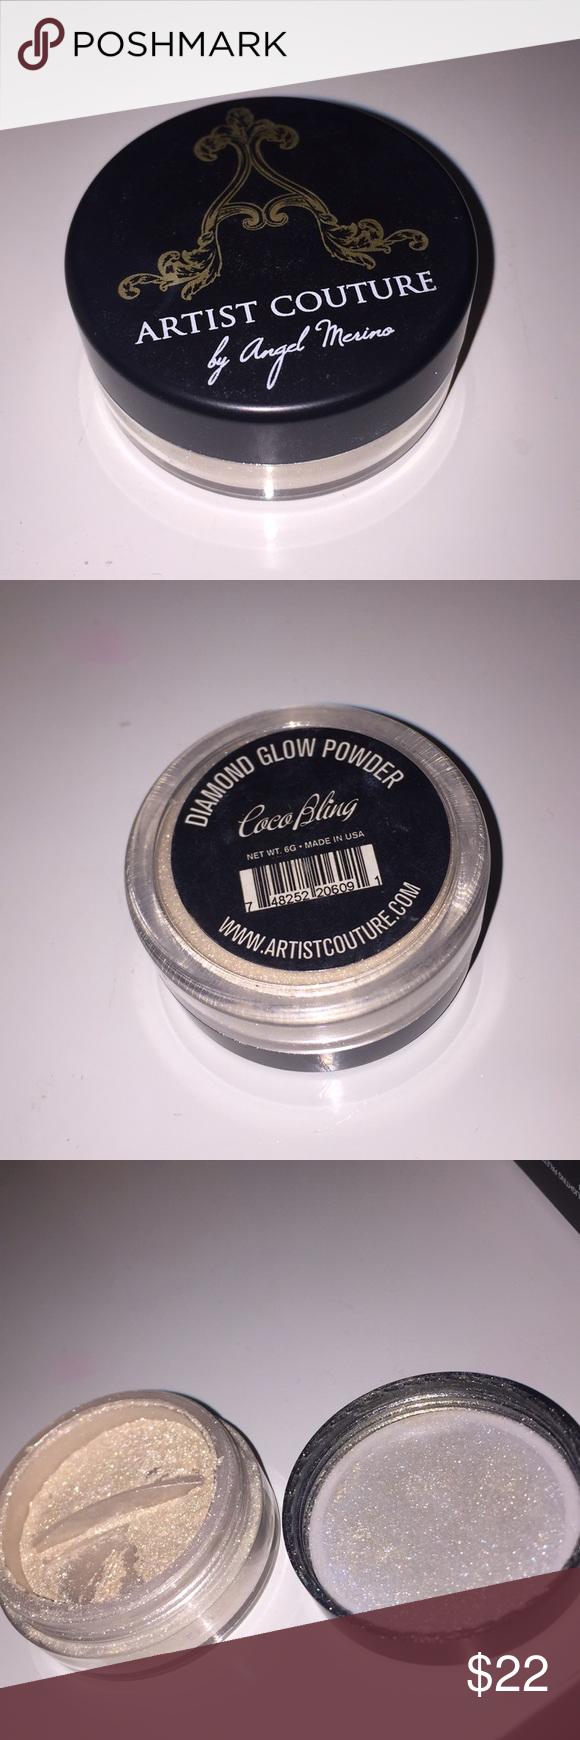 Artist Couture diamond glow powder A Highlighting powder